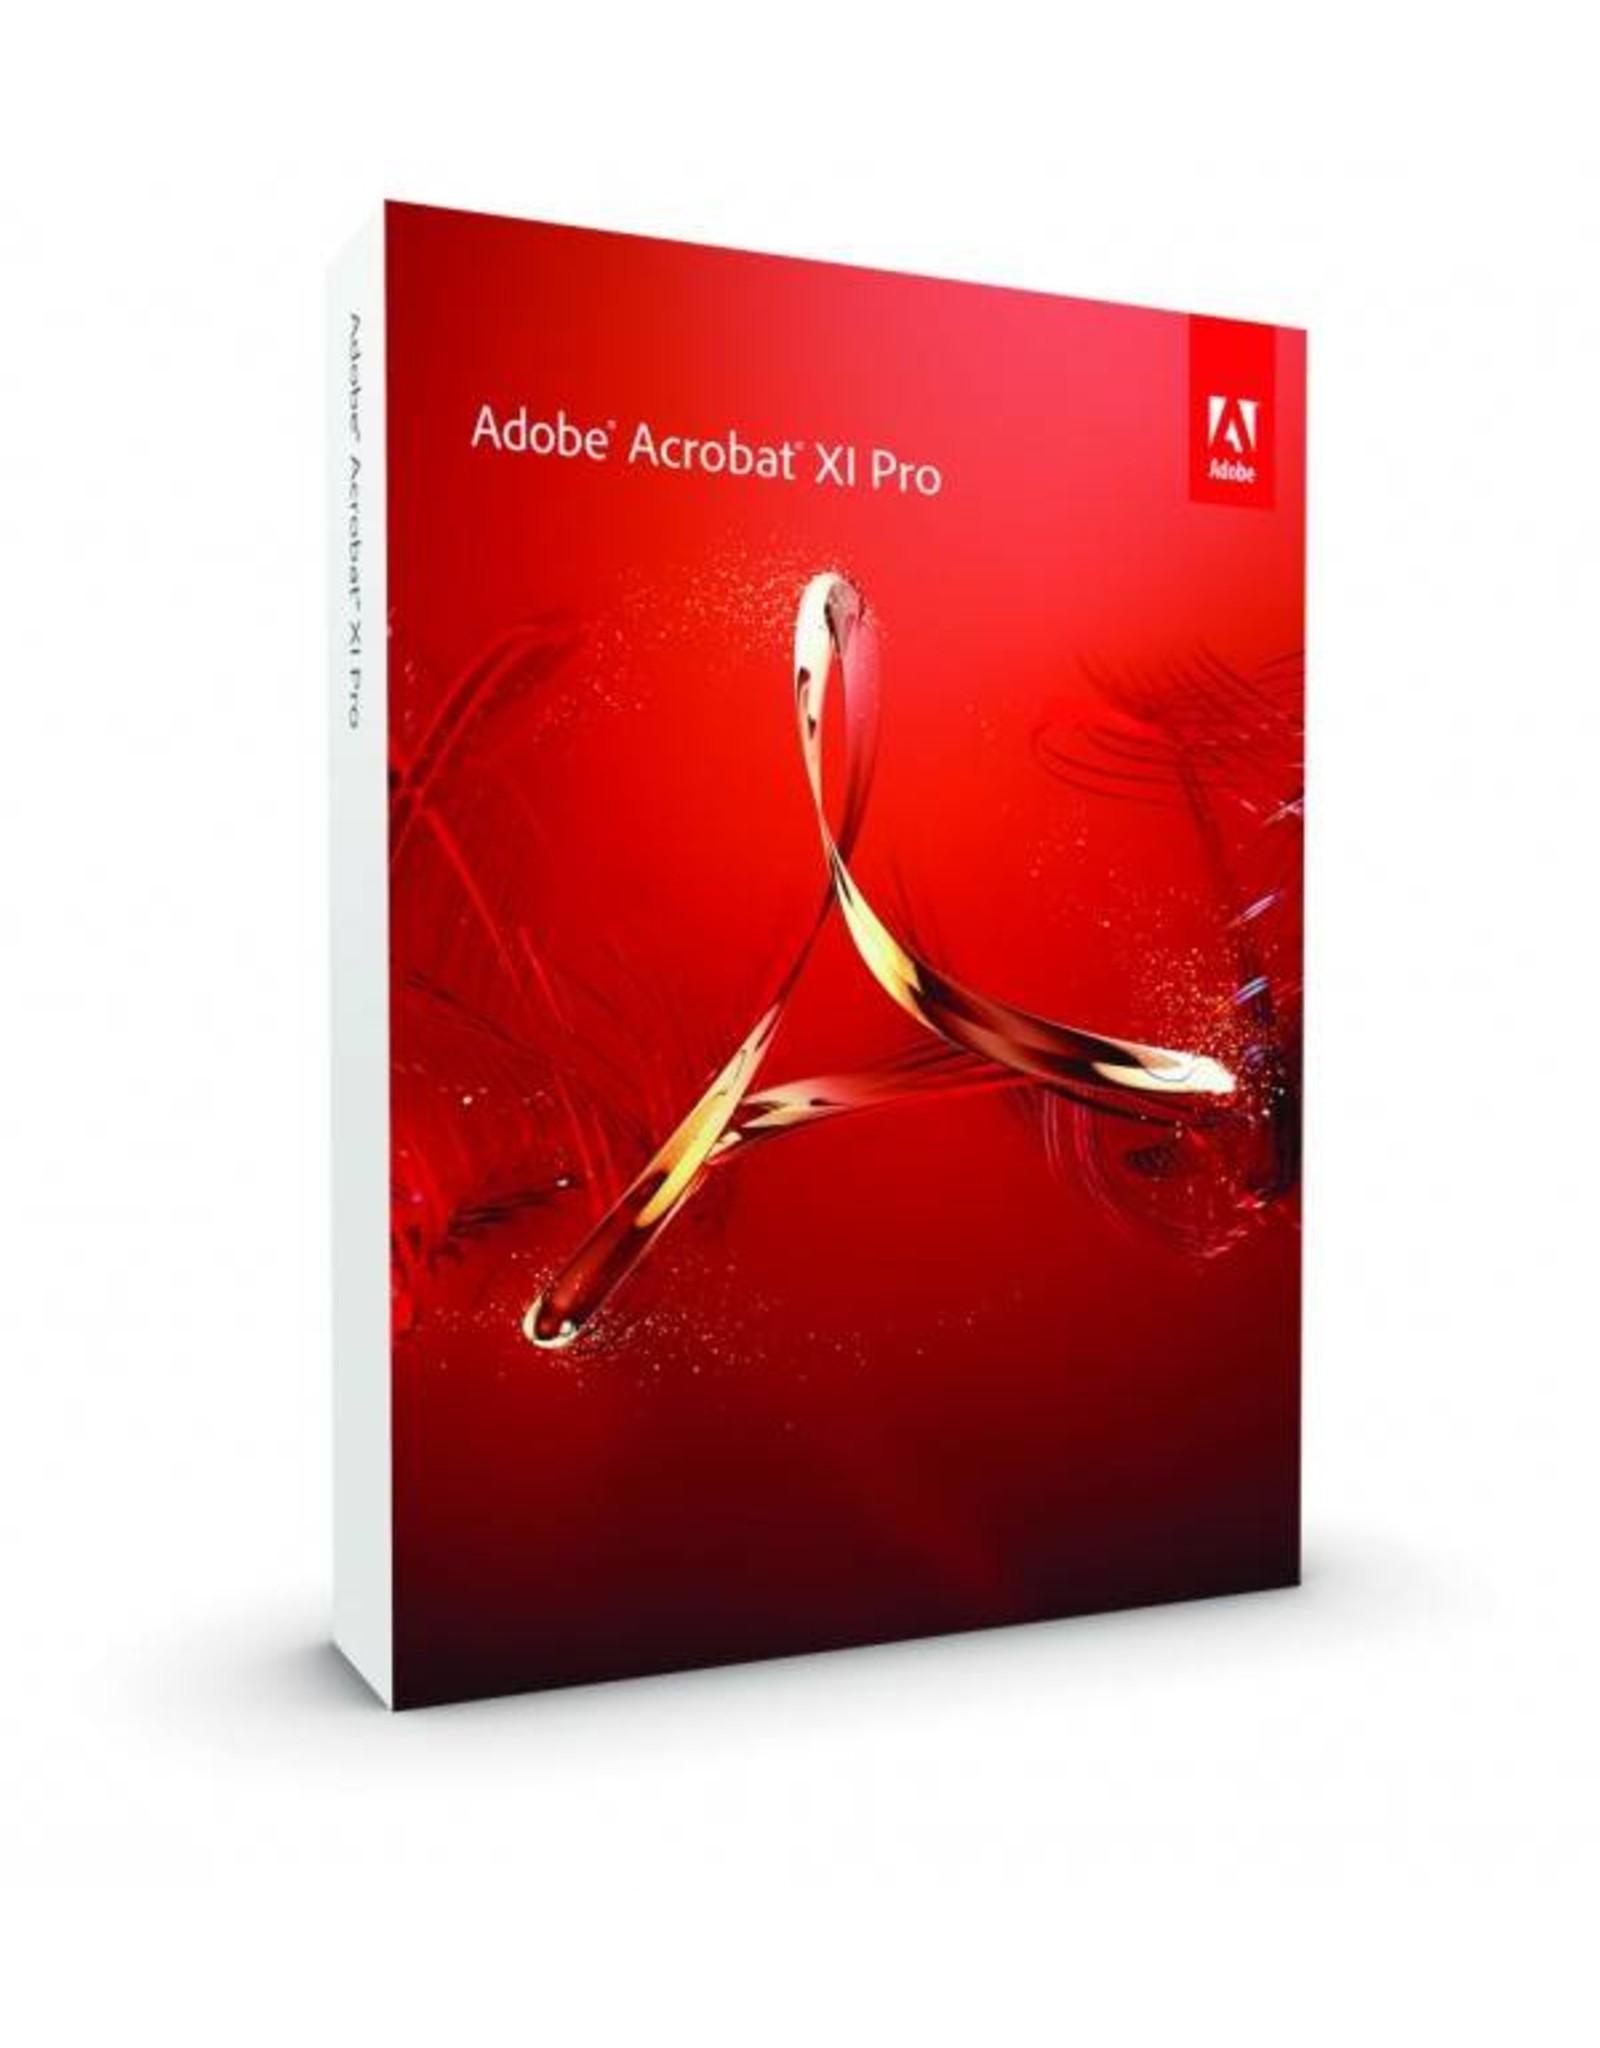 Adobe Adobe Acrobat XI Pro for PC